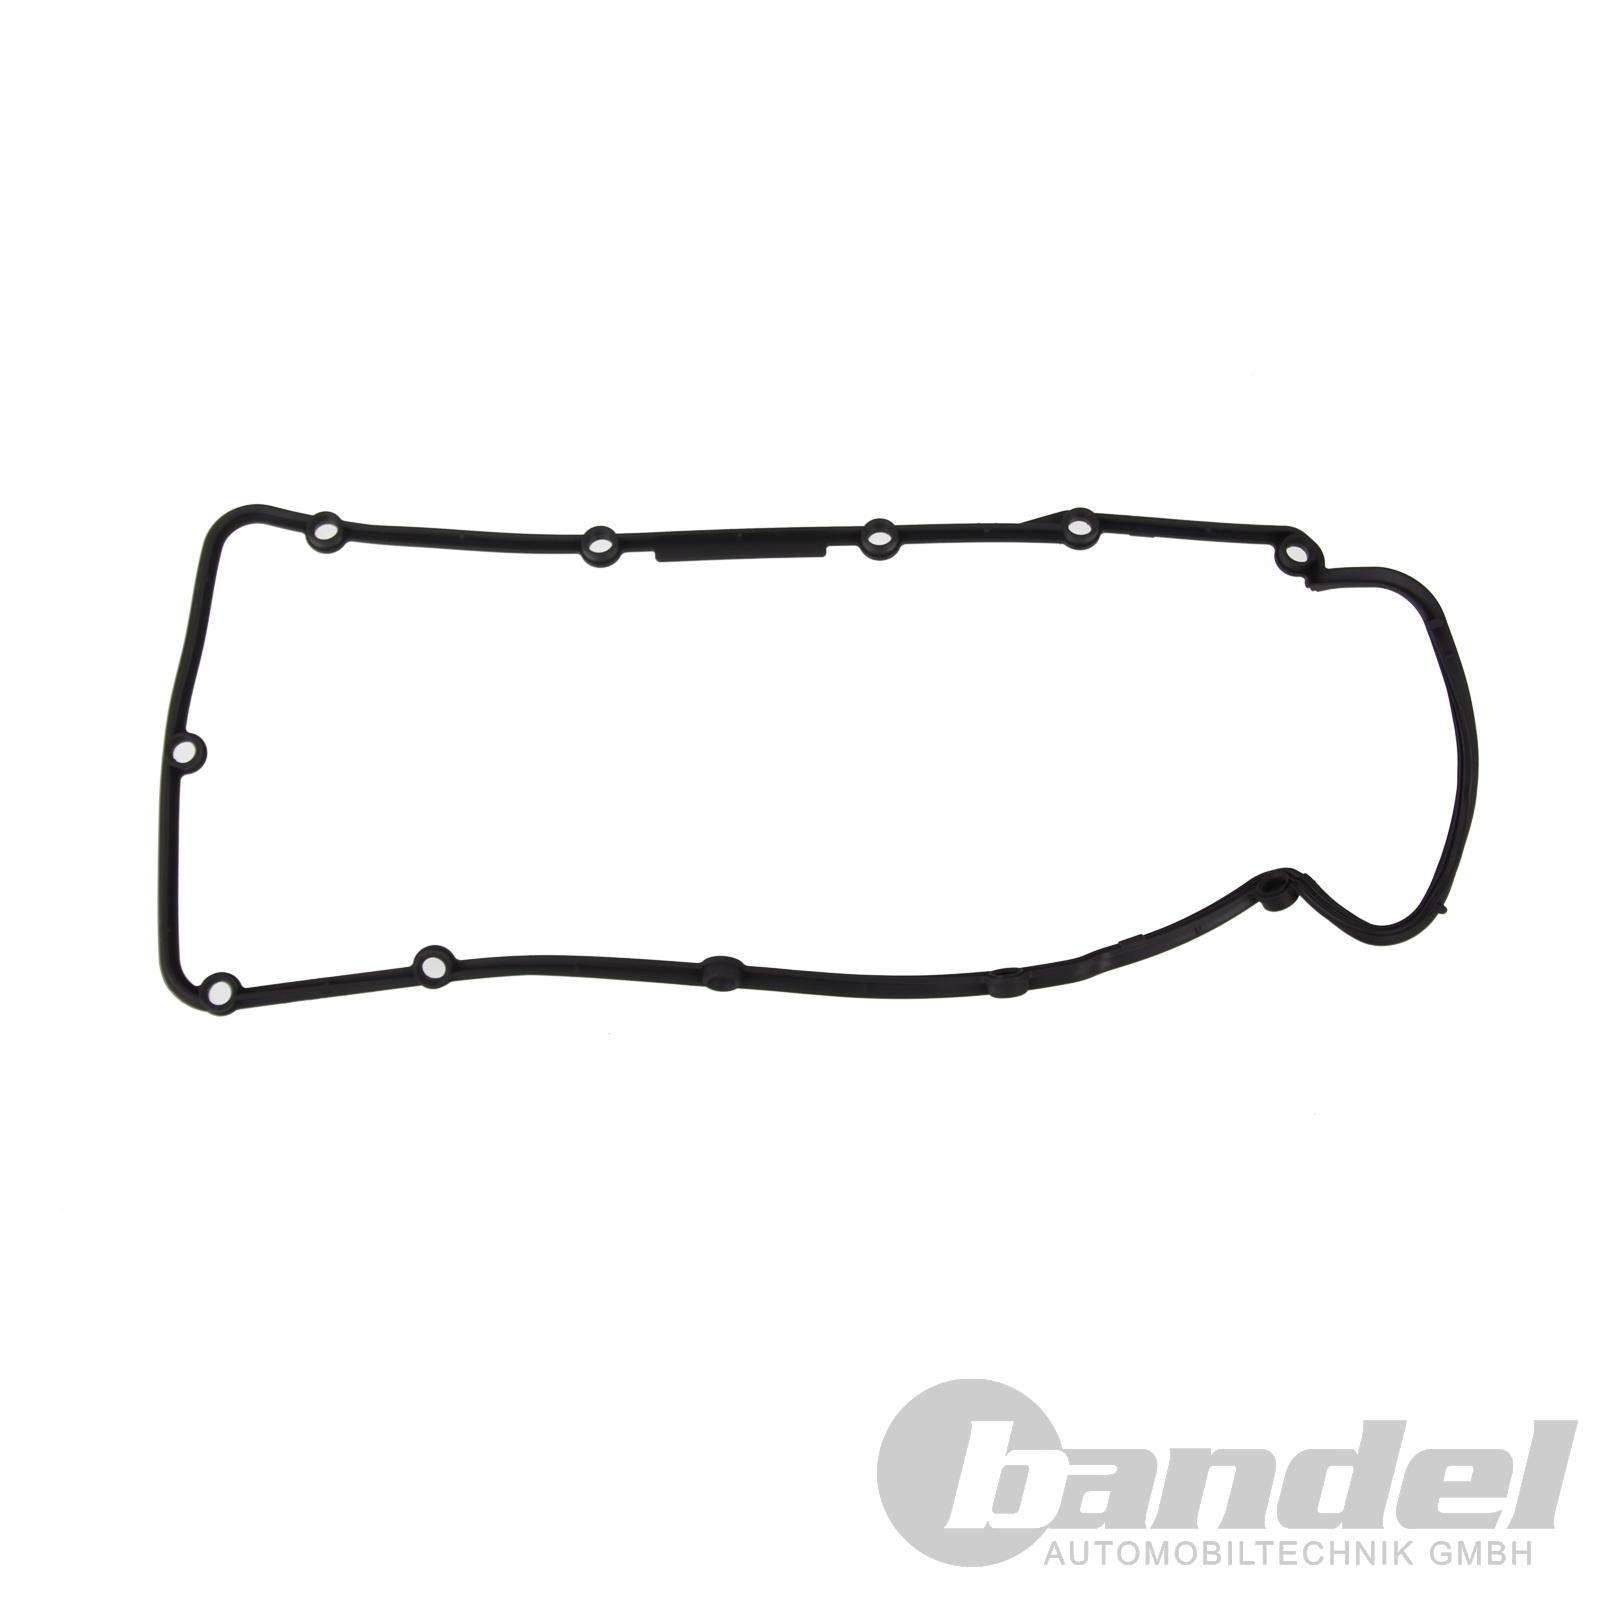 Ventildeckeldichtung Ford Galaxy Vw Golf Iv T5 Pheaton